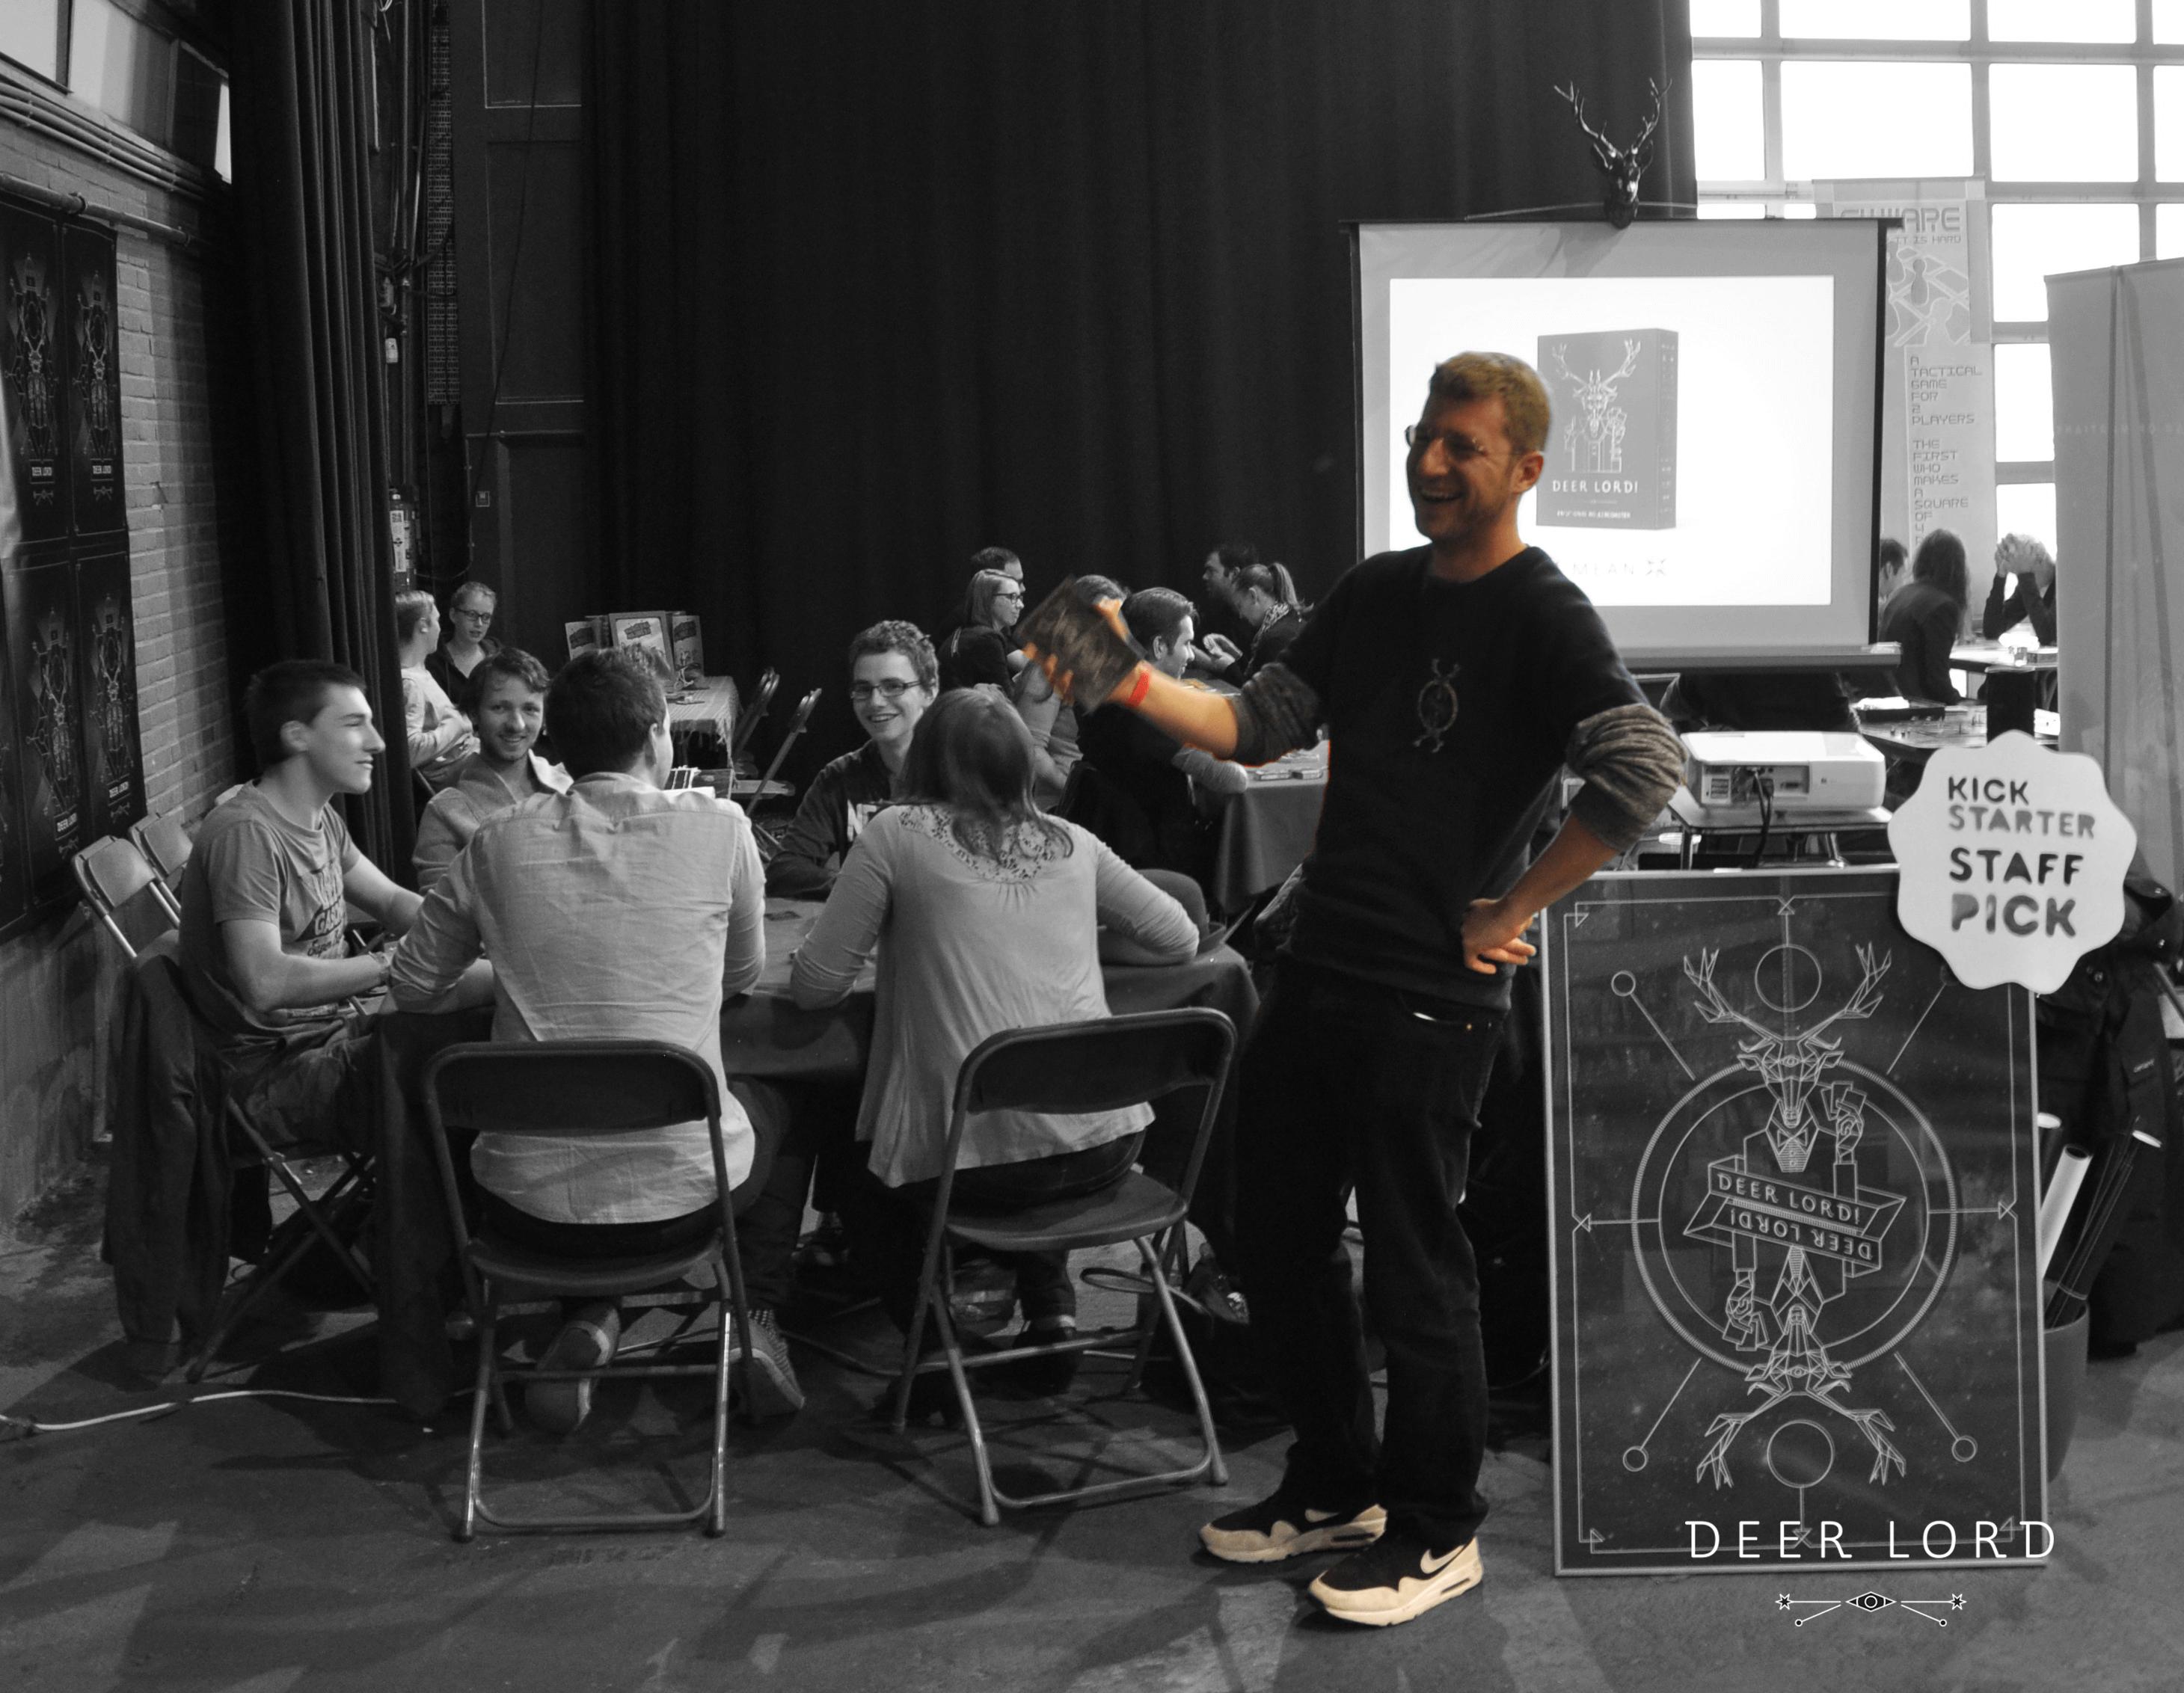 Dries De Geyter at Spel 2015